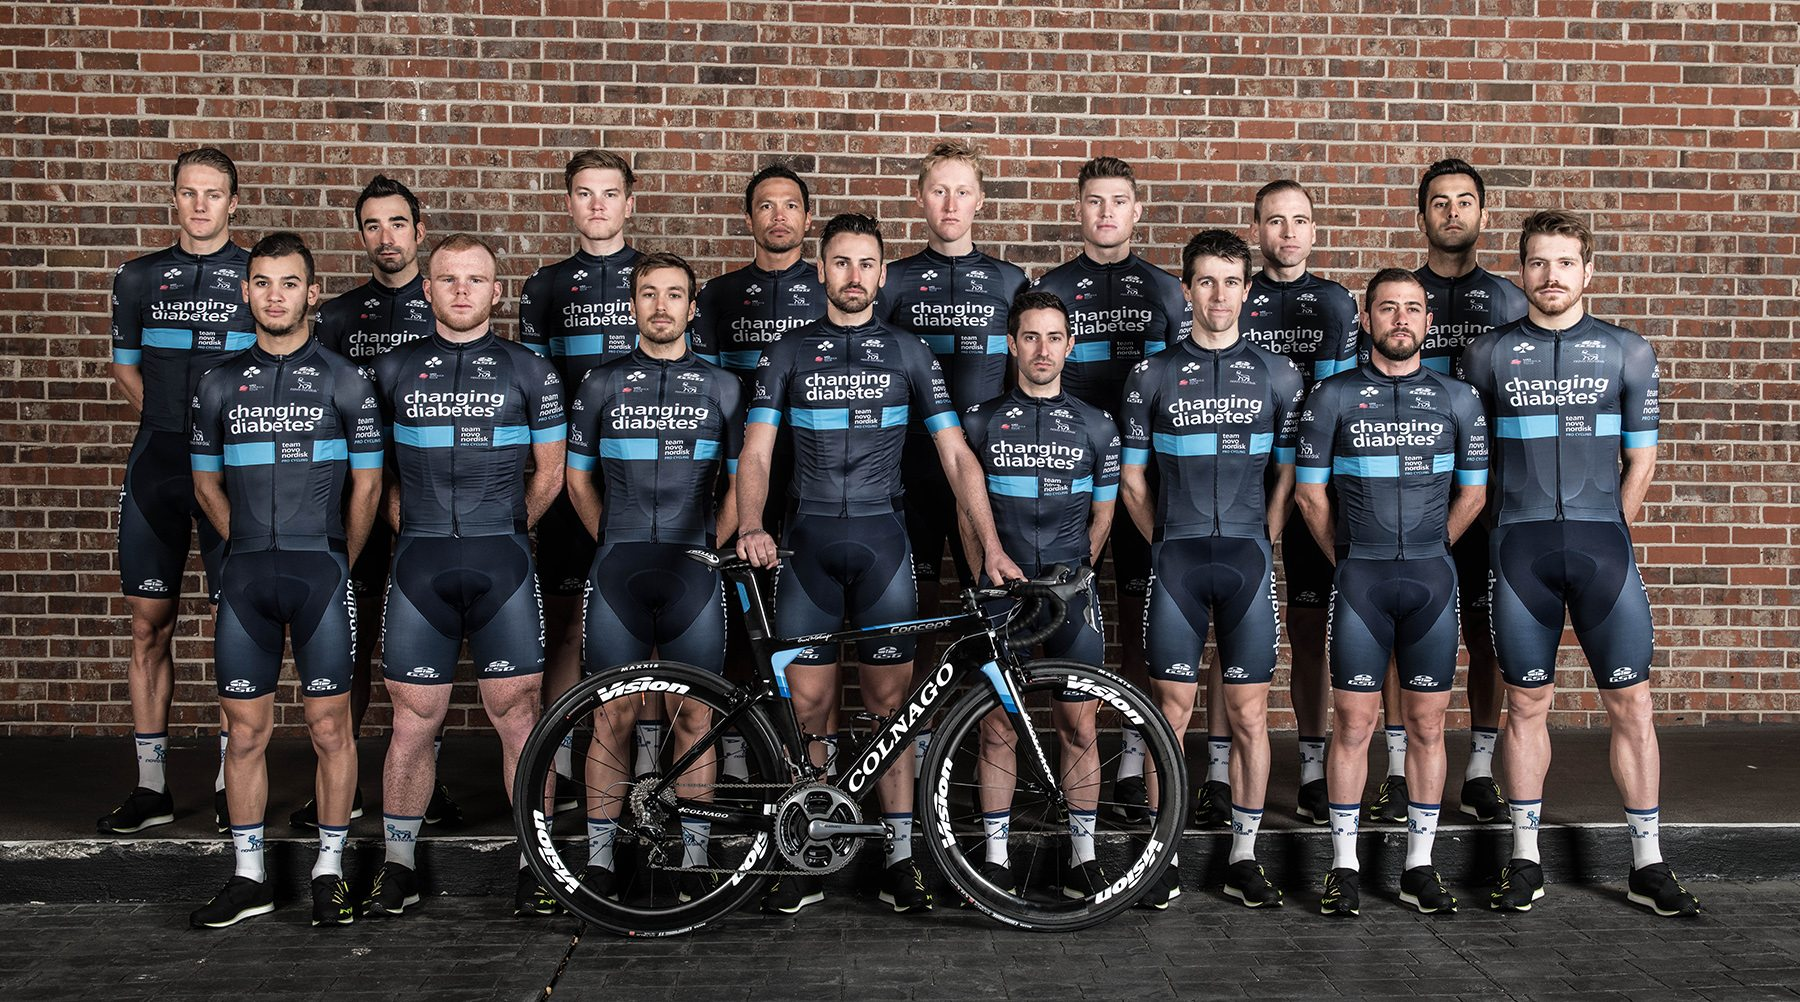 Team Novo Nordisk